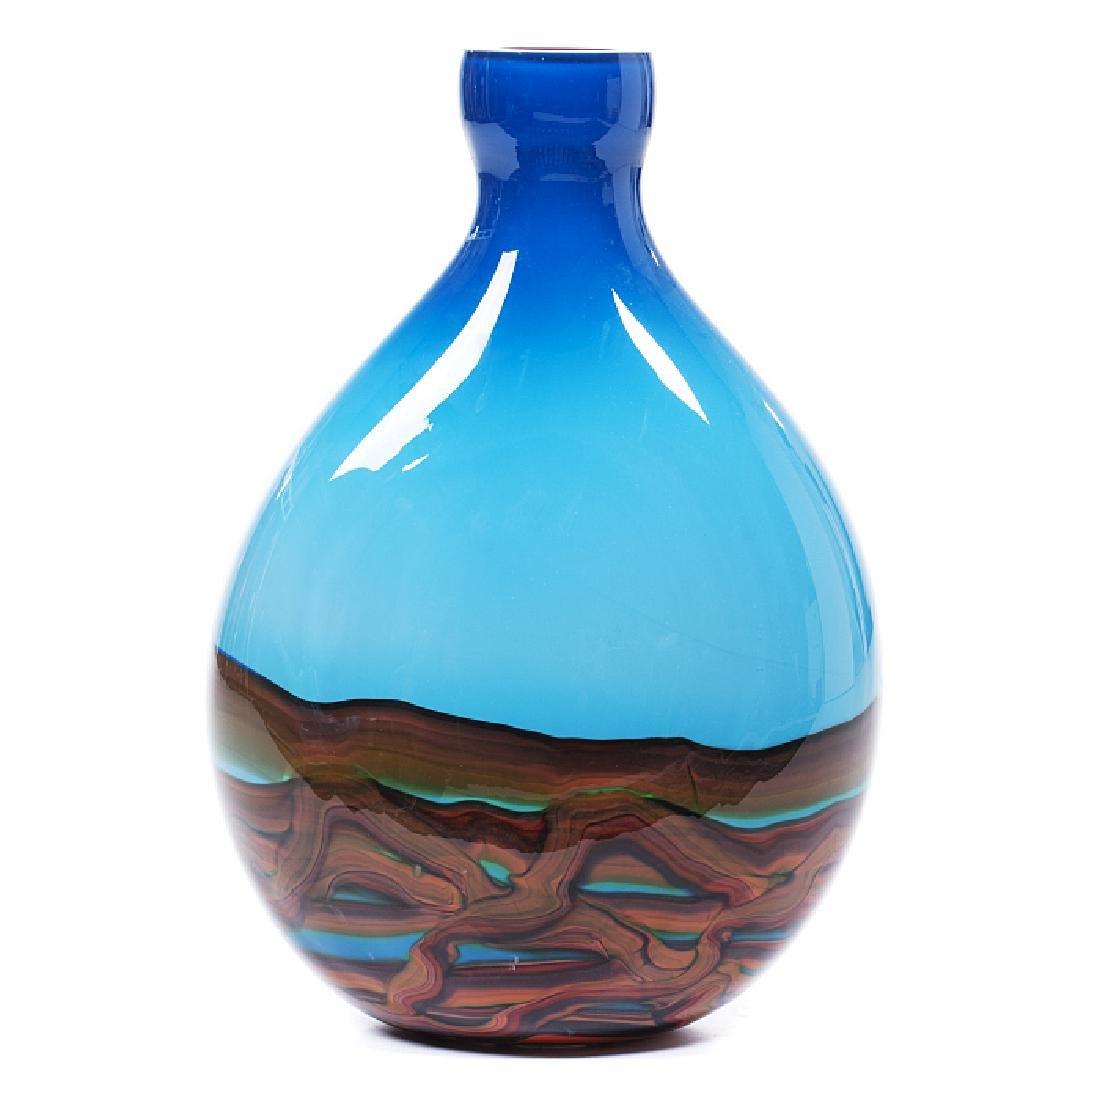 Large jug in Murano glass